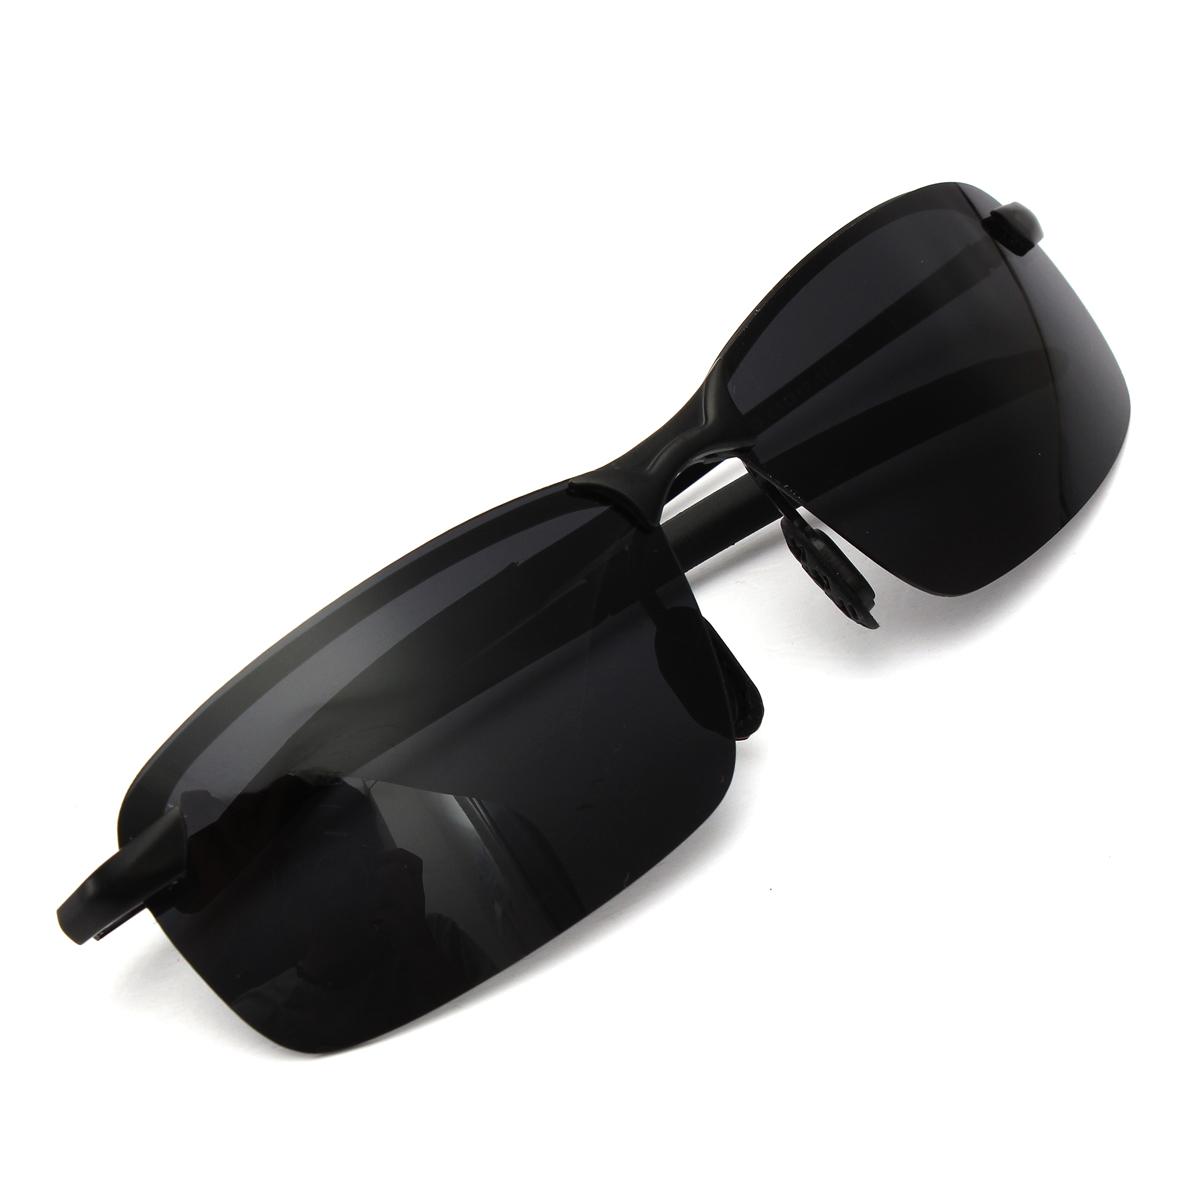 Men Black Polarized Glasses Outdoor Sports Eyewear Driving UV Sunglasses | eBay